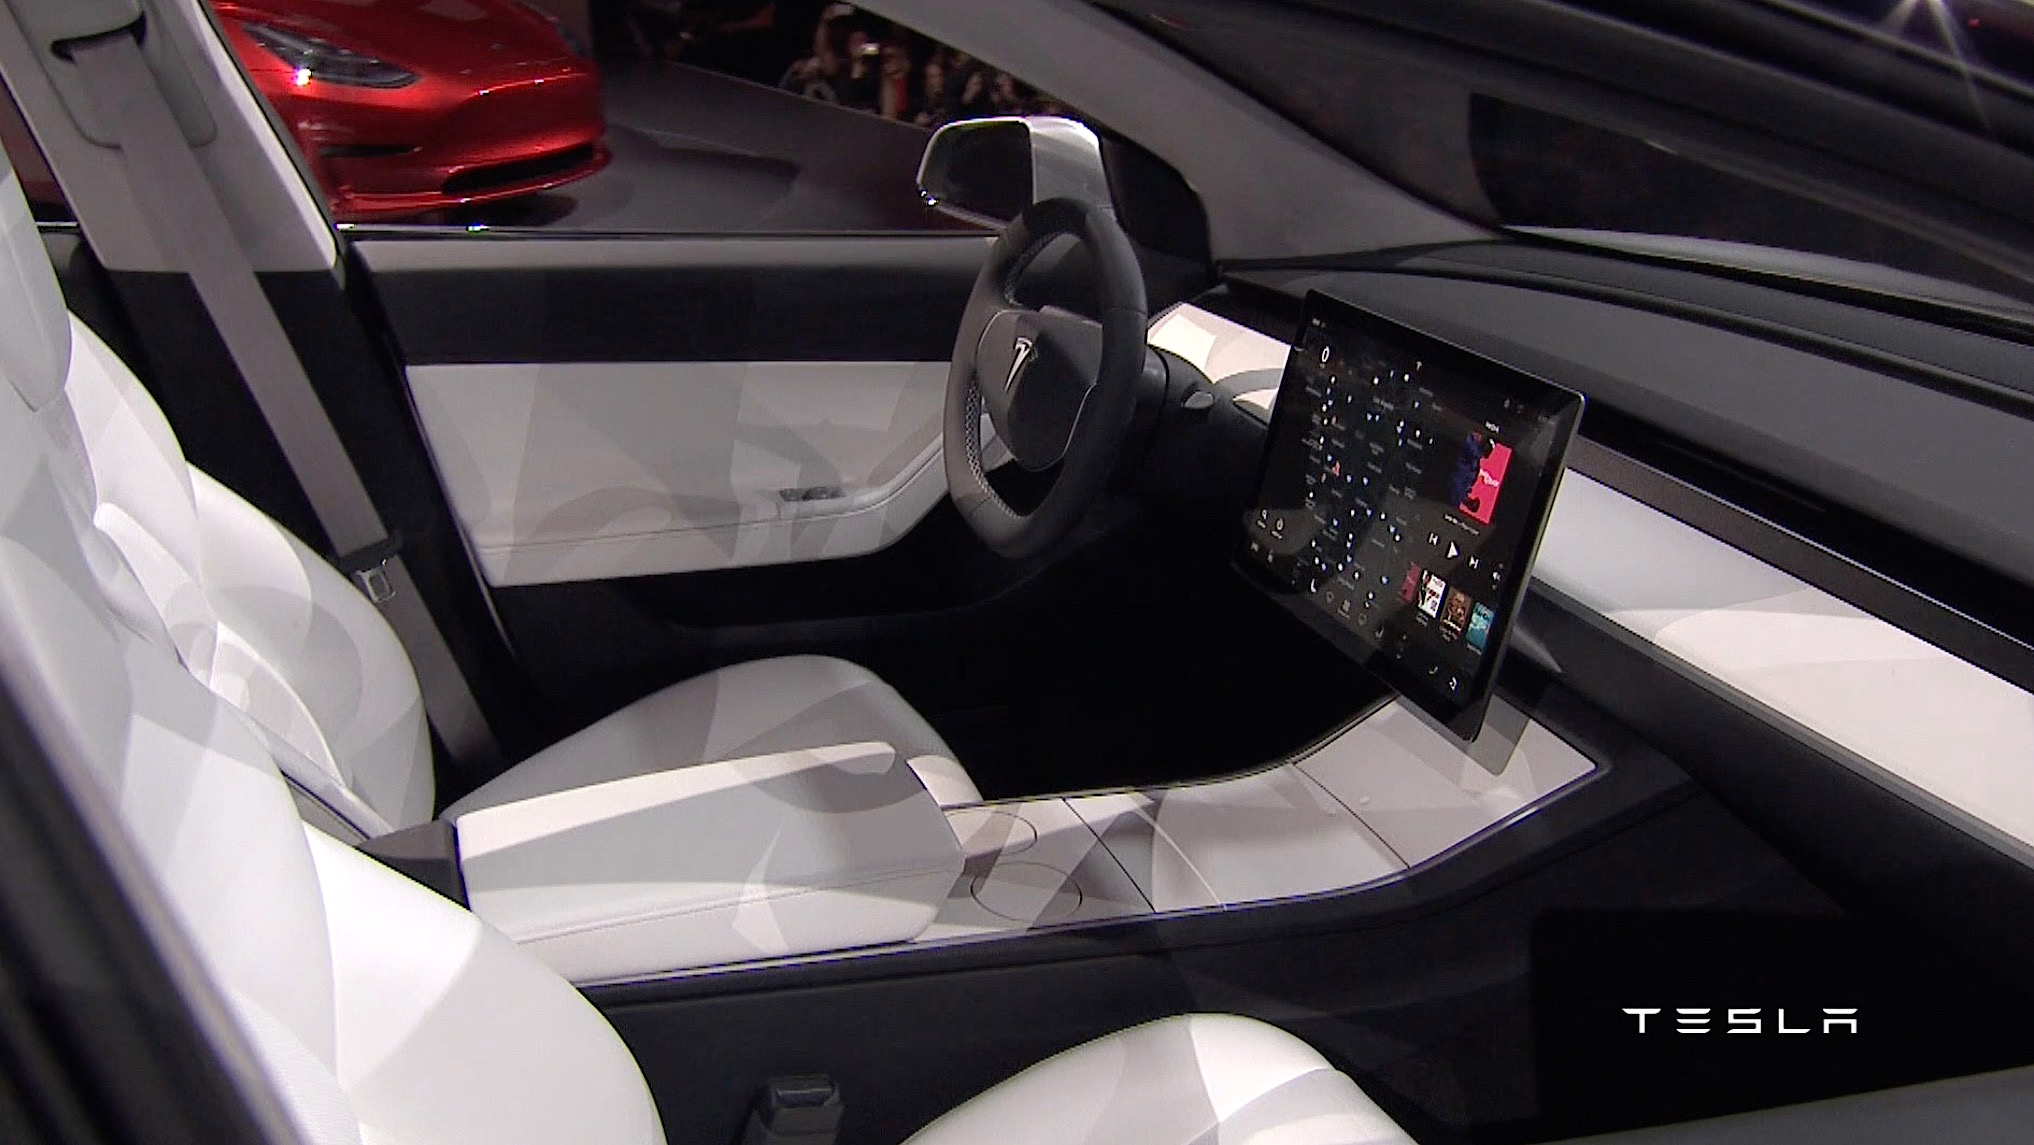 TeslaModelS_interior_interieur2